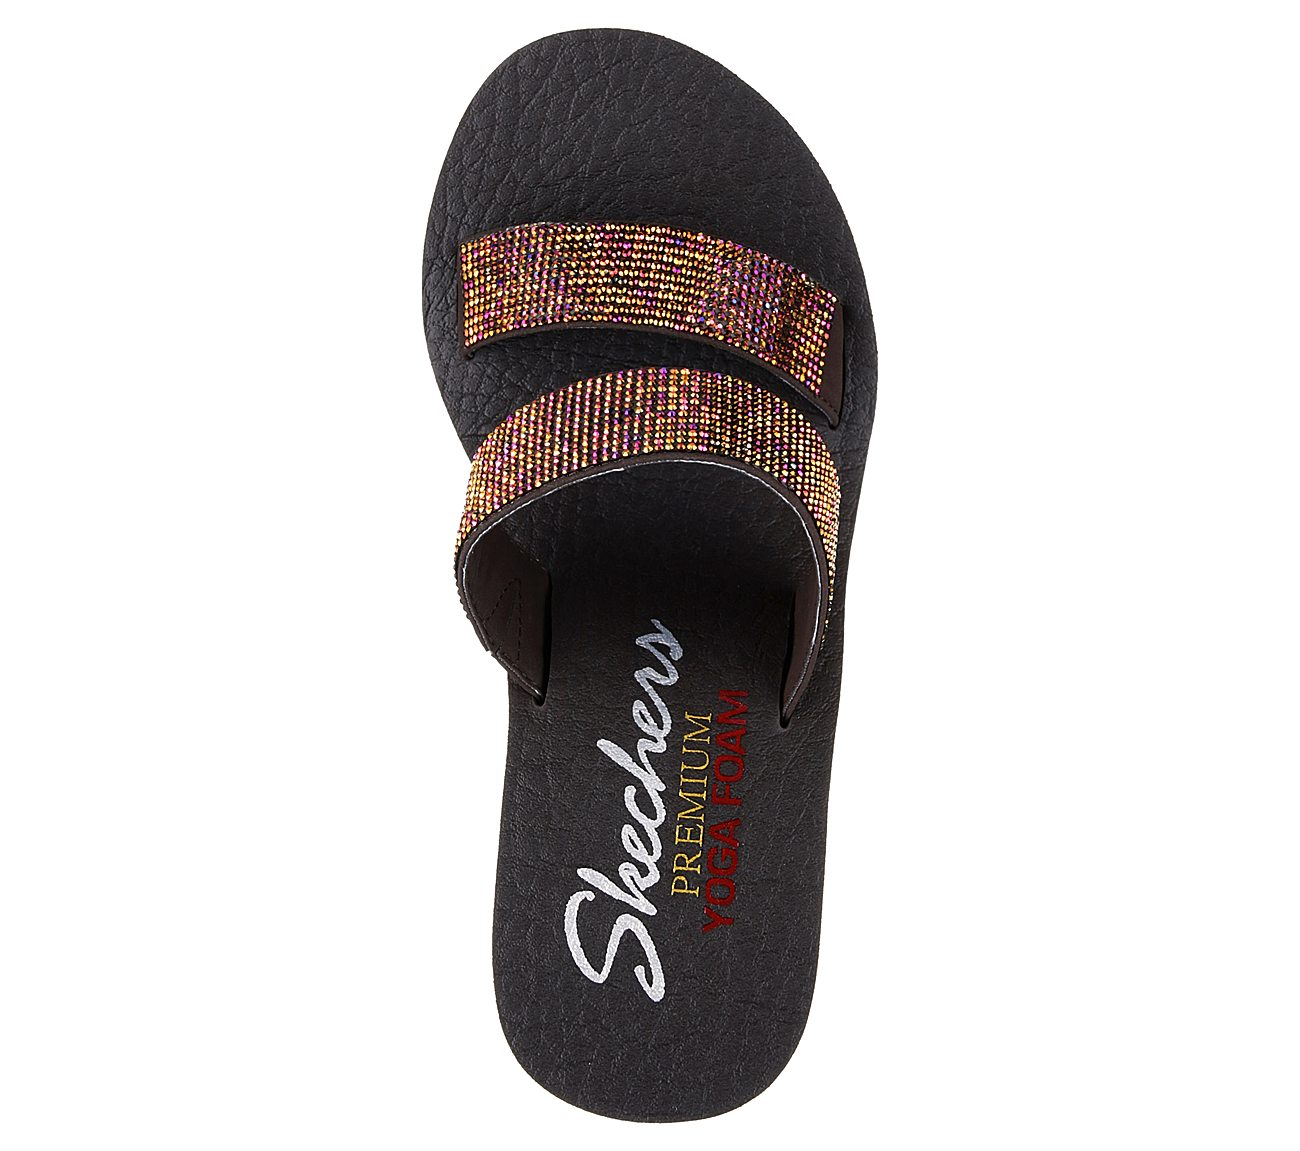 c2e08a0b431b Buy SKECHERS Bohemian Arrow - Lil Bloom Cali Shoes only  50.00